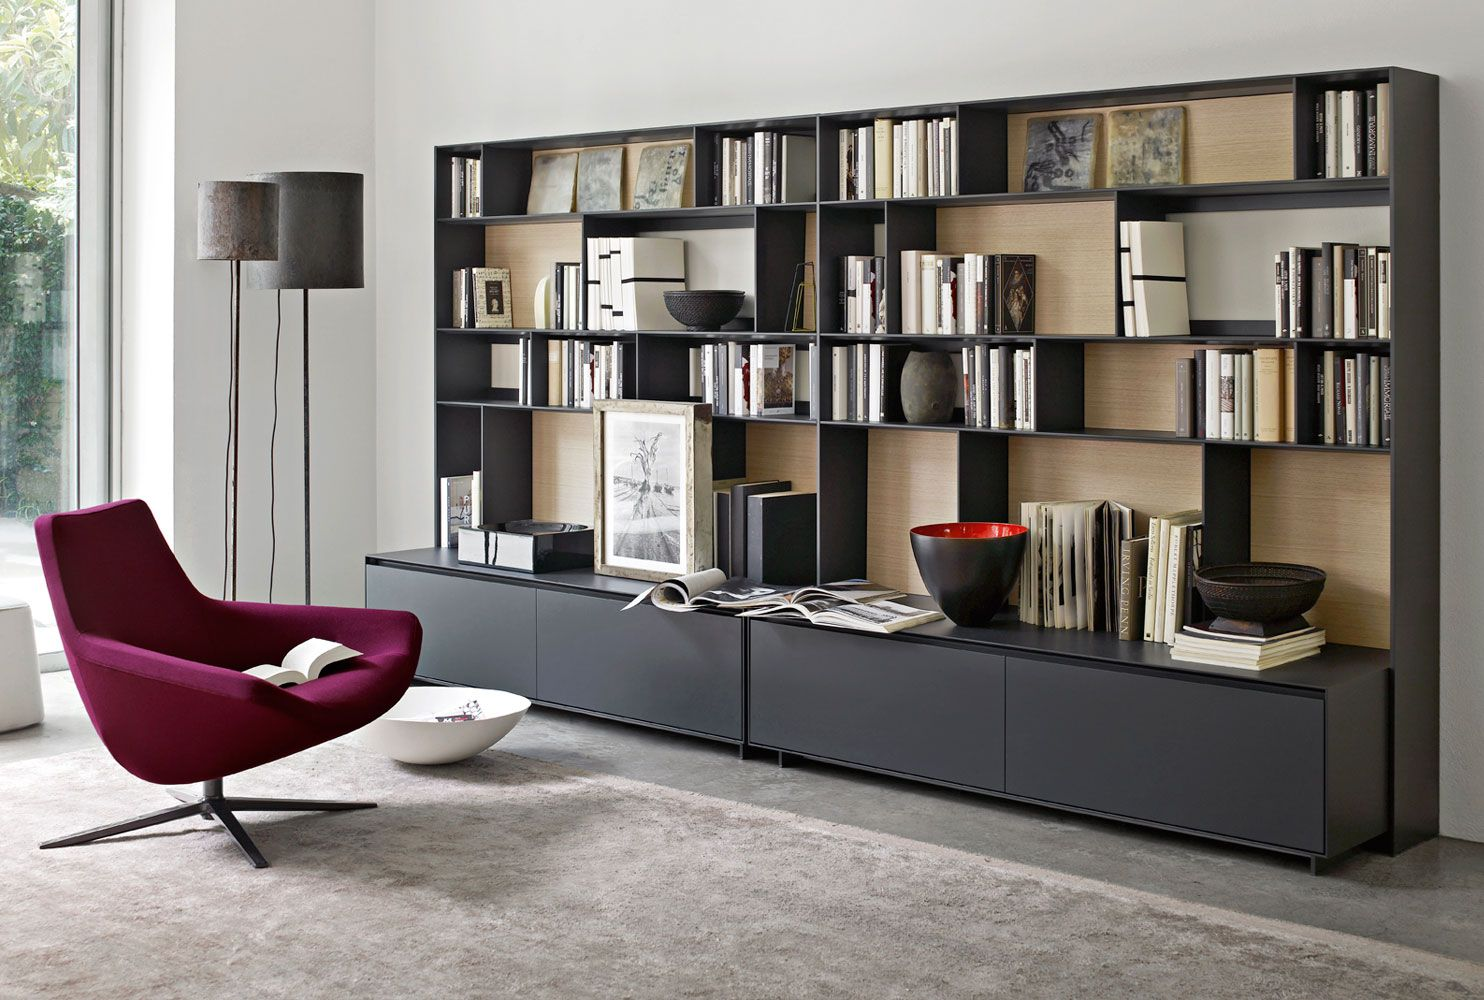 System bookcase flat c collection b b italia design for B et b italia